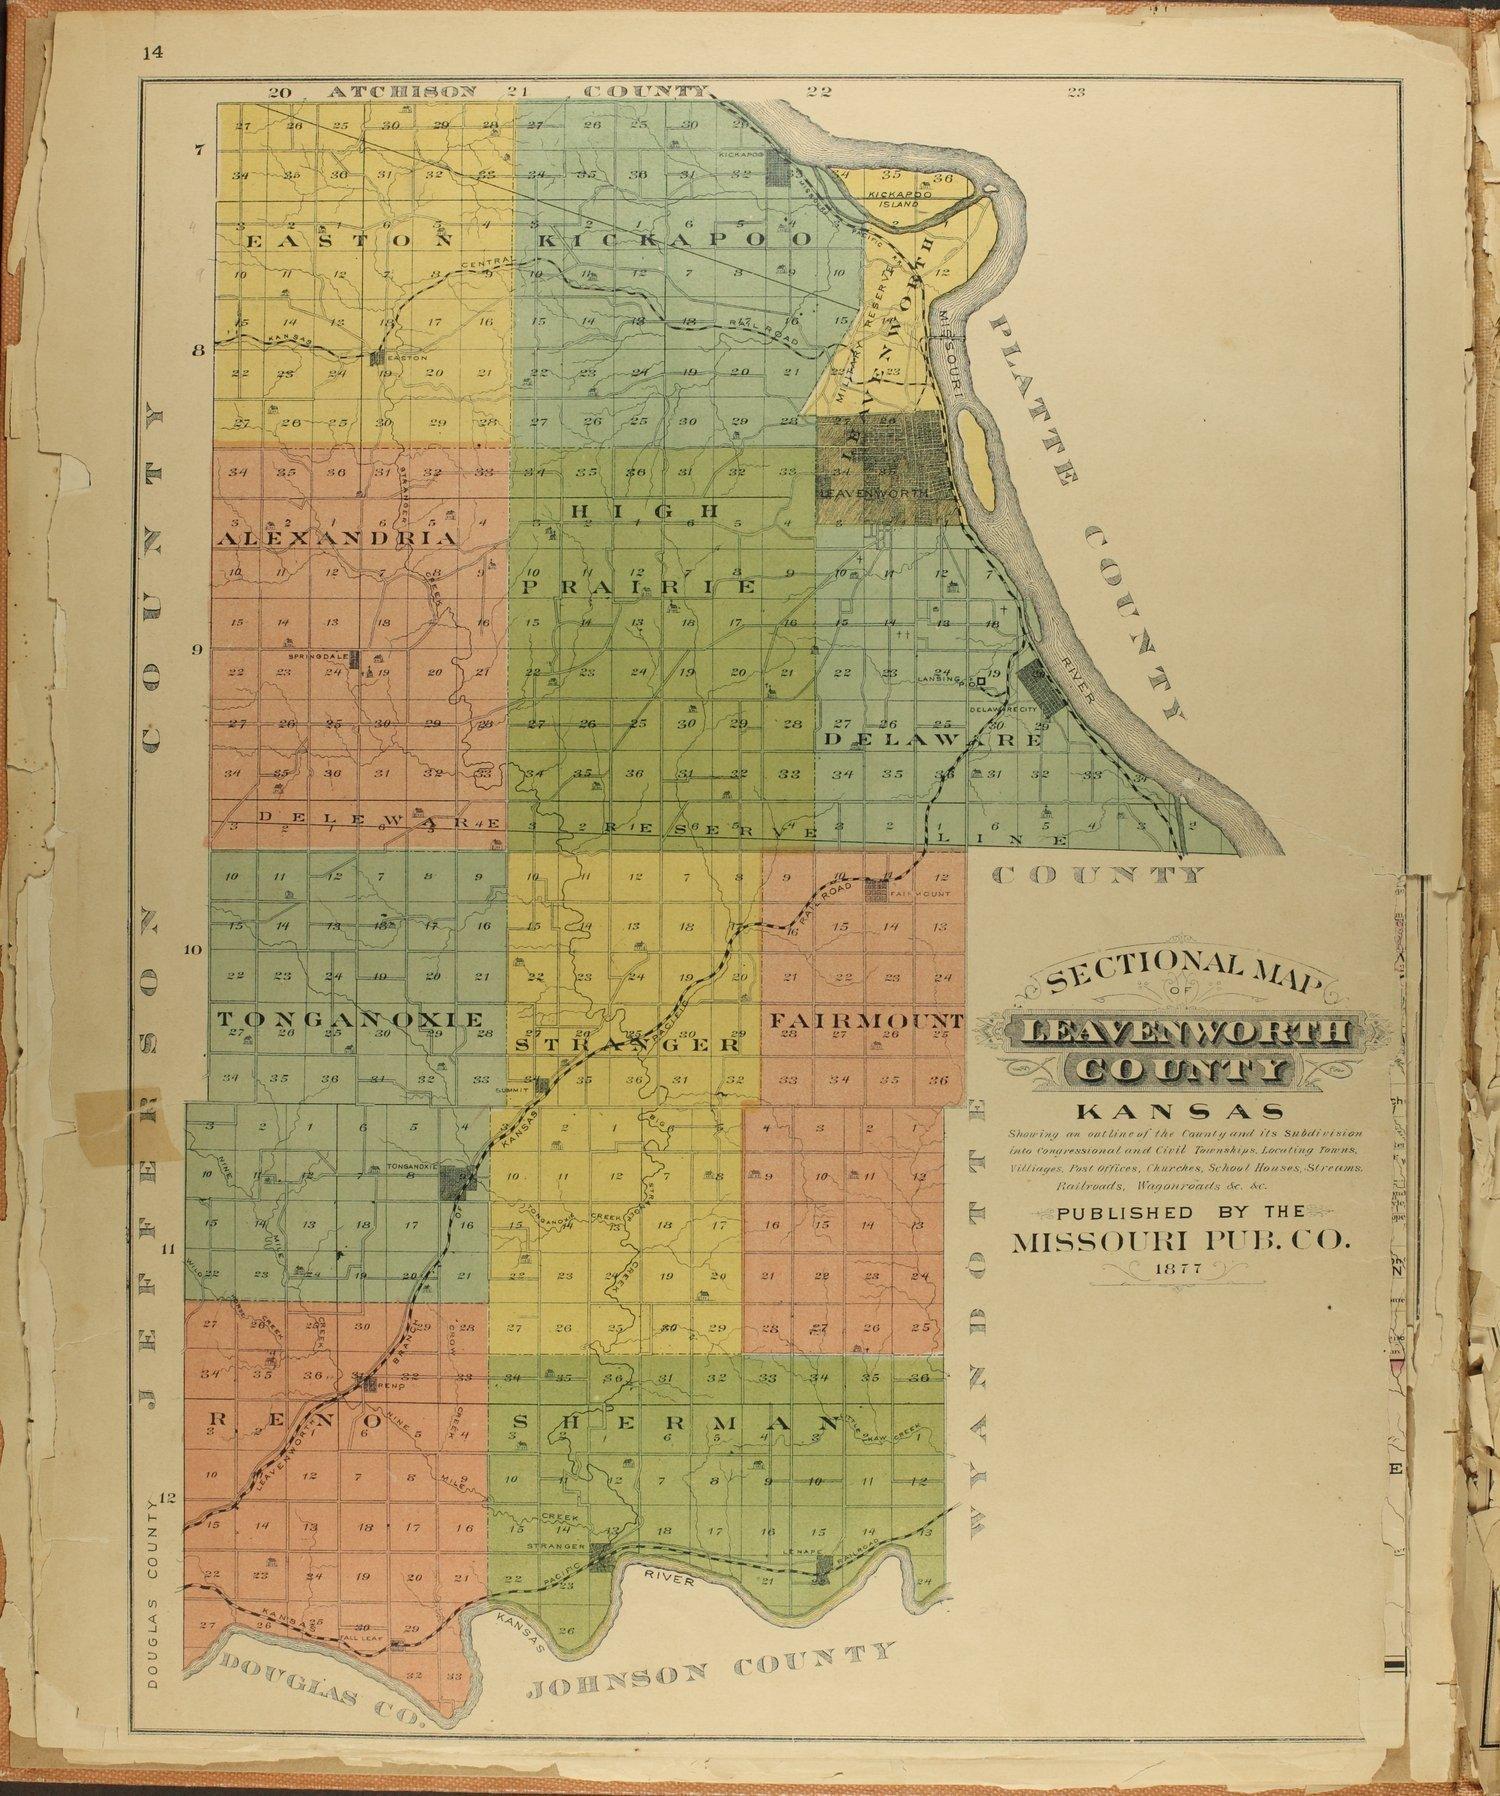 Atlas map of Leavenworth County, Kansas - 14